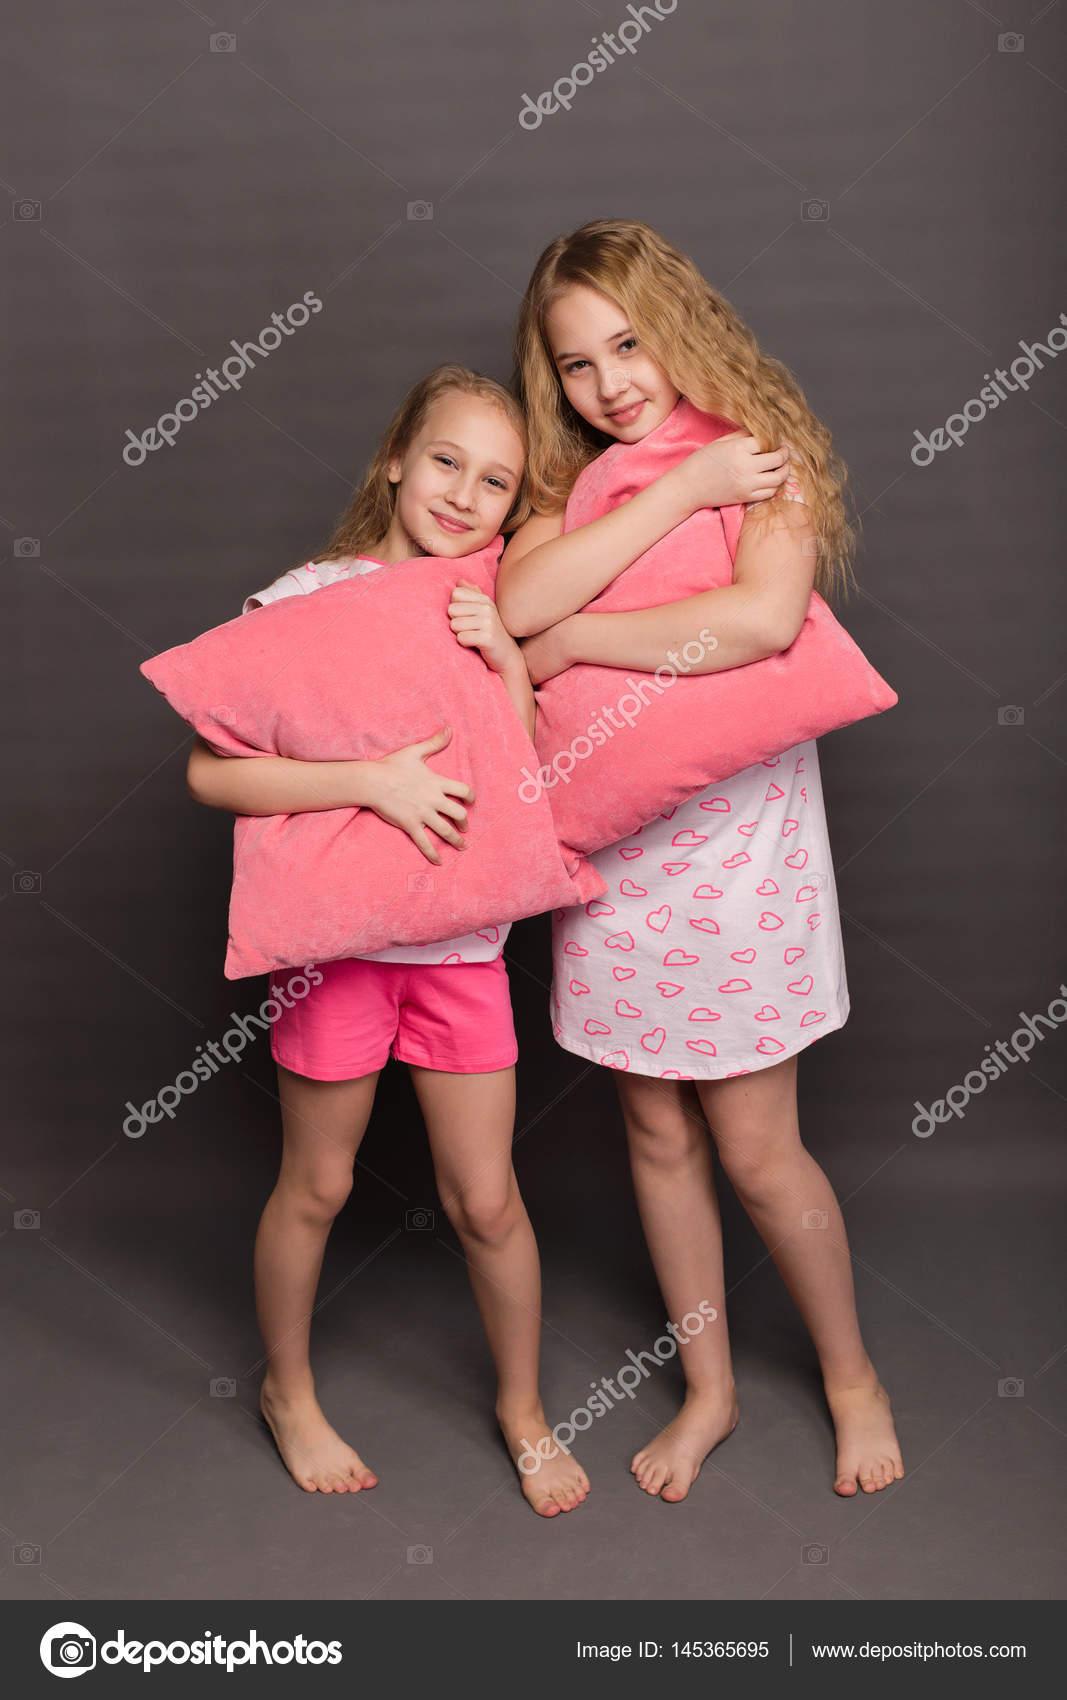 belles deux filles en pyjama rose jouent avant d aller au lit photographie nadin1601877 gmail. Black Bedroom Furniture Sets. Home Design Ideas